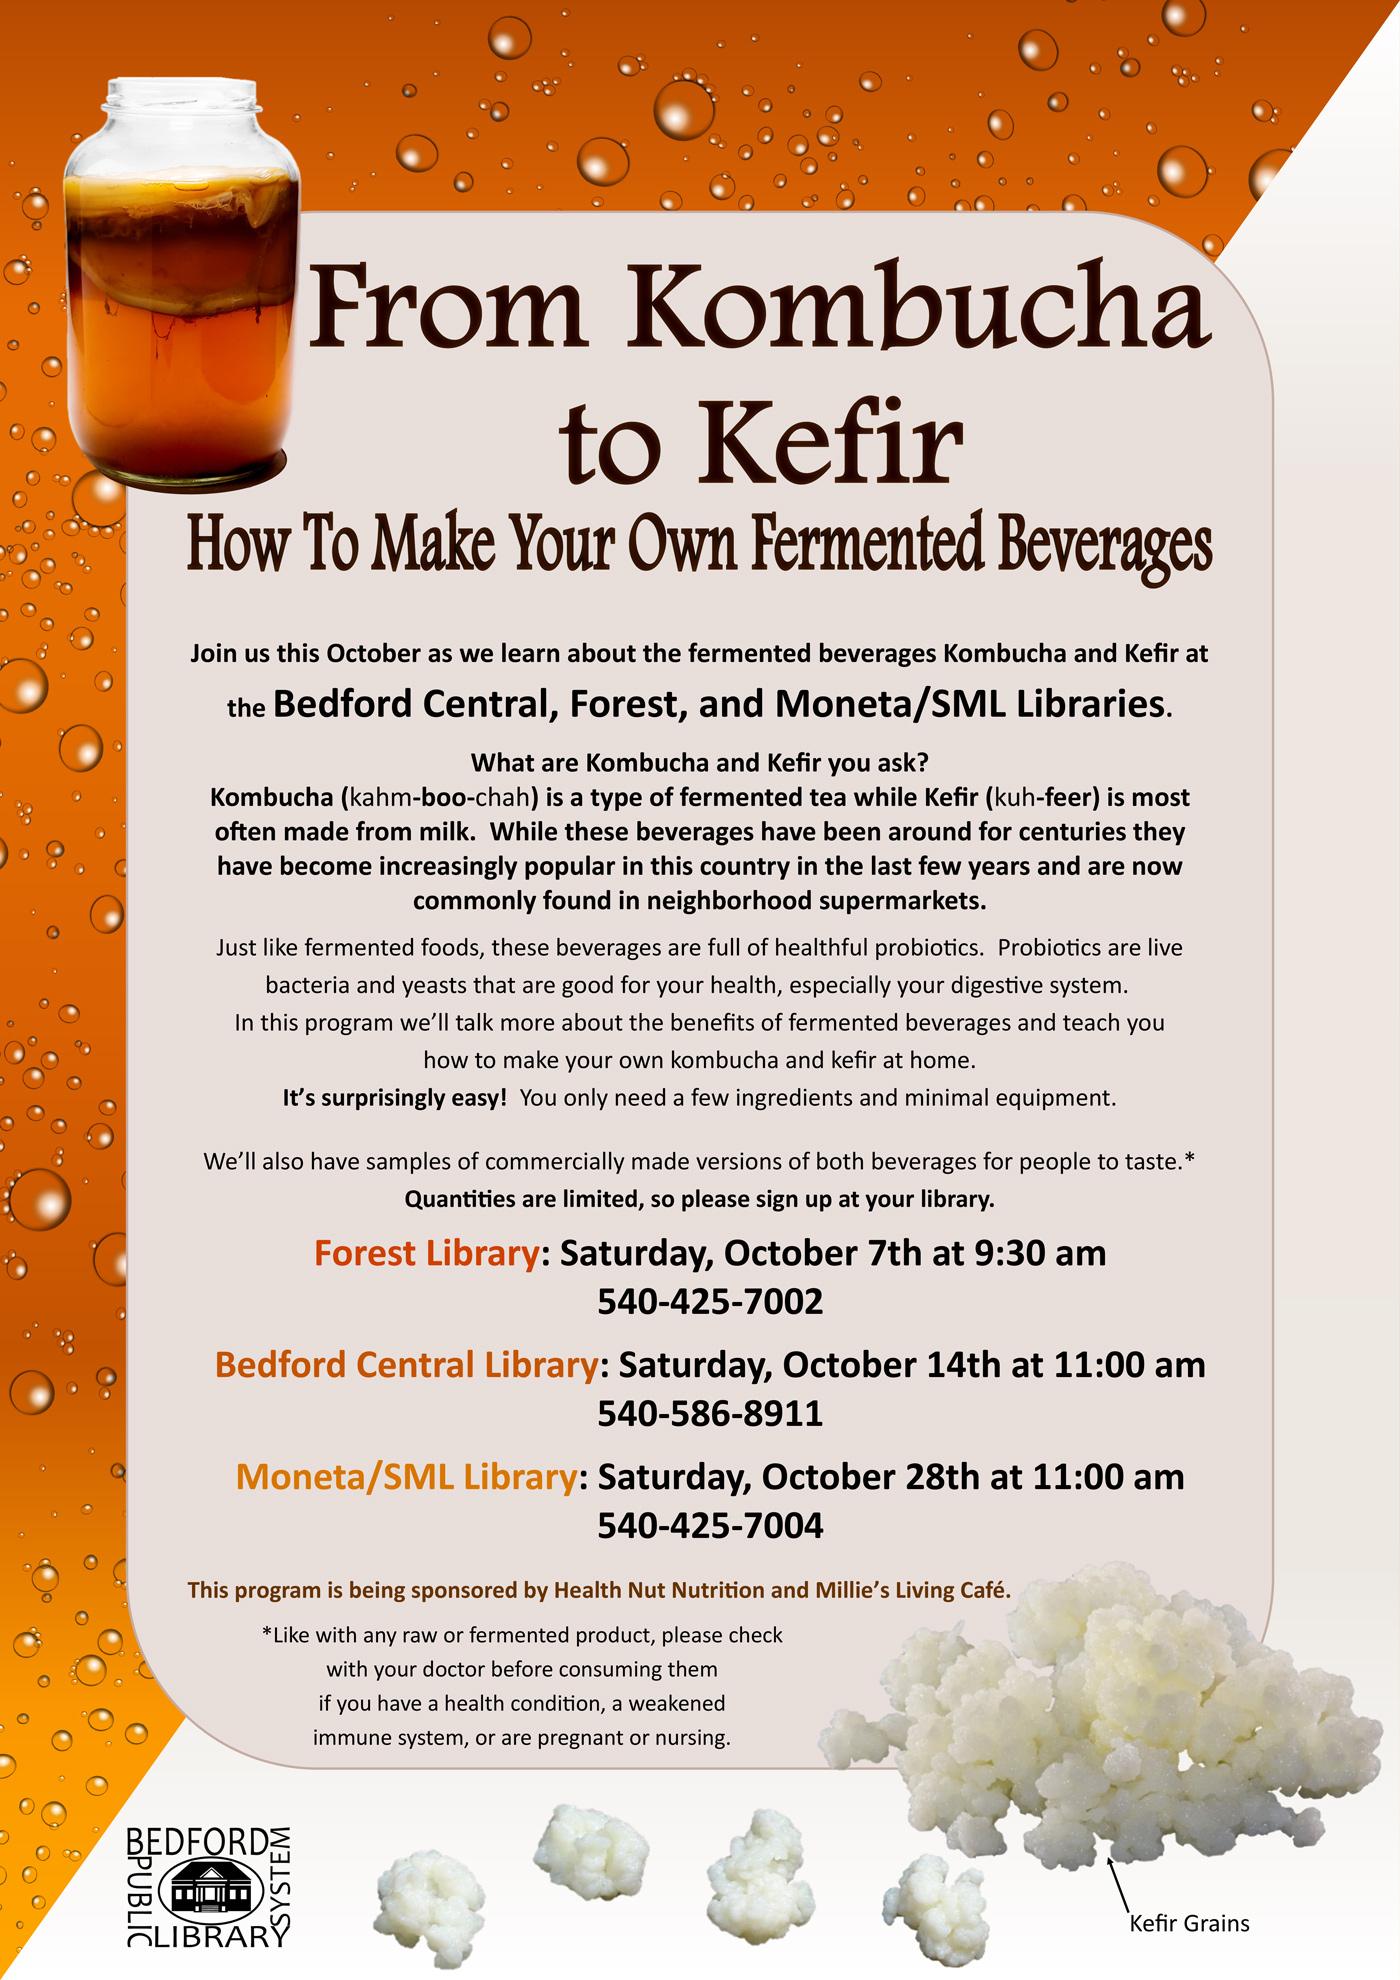 Kombucha-to-Kefir-Poster.jpg